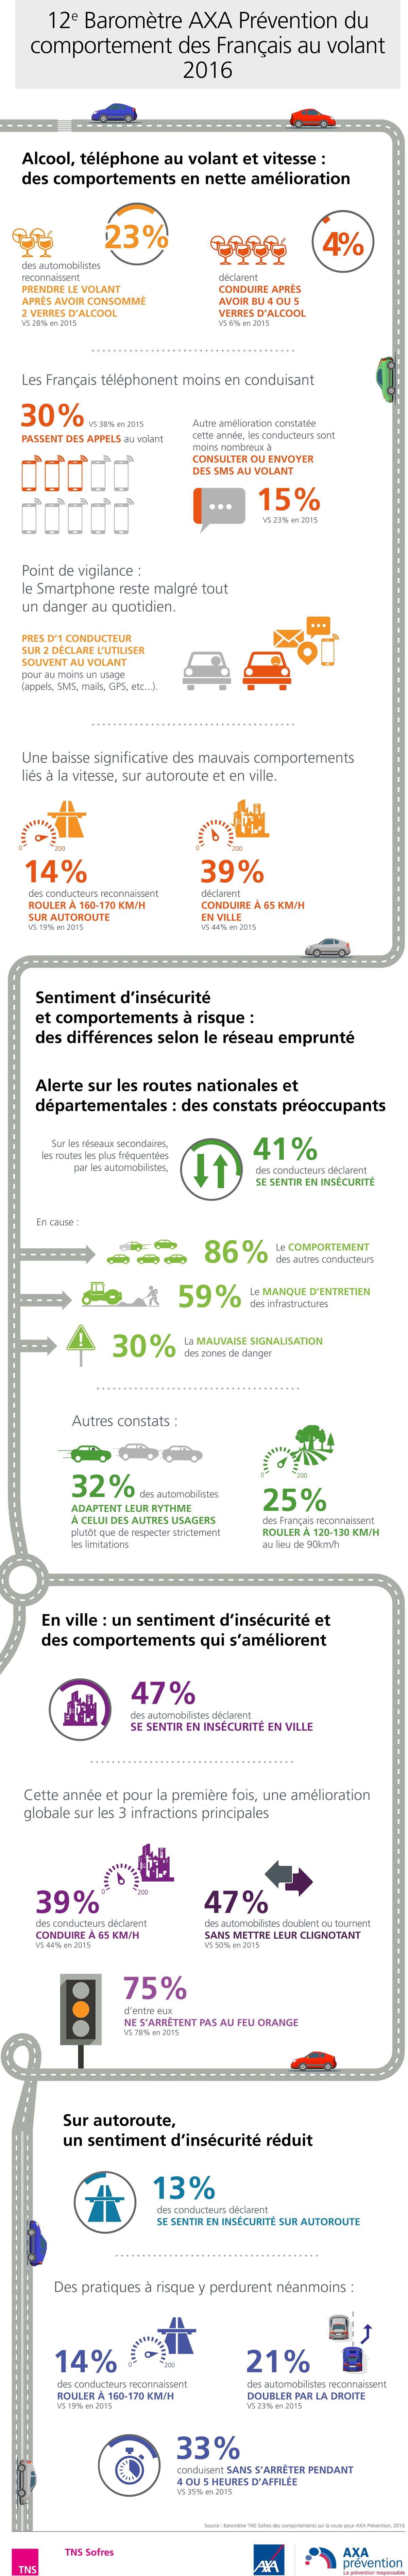 Infographie-barometre-12-axa-auto-2016